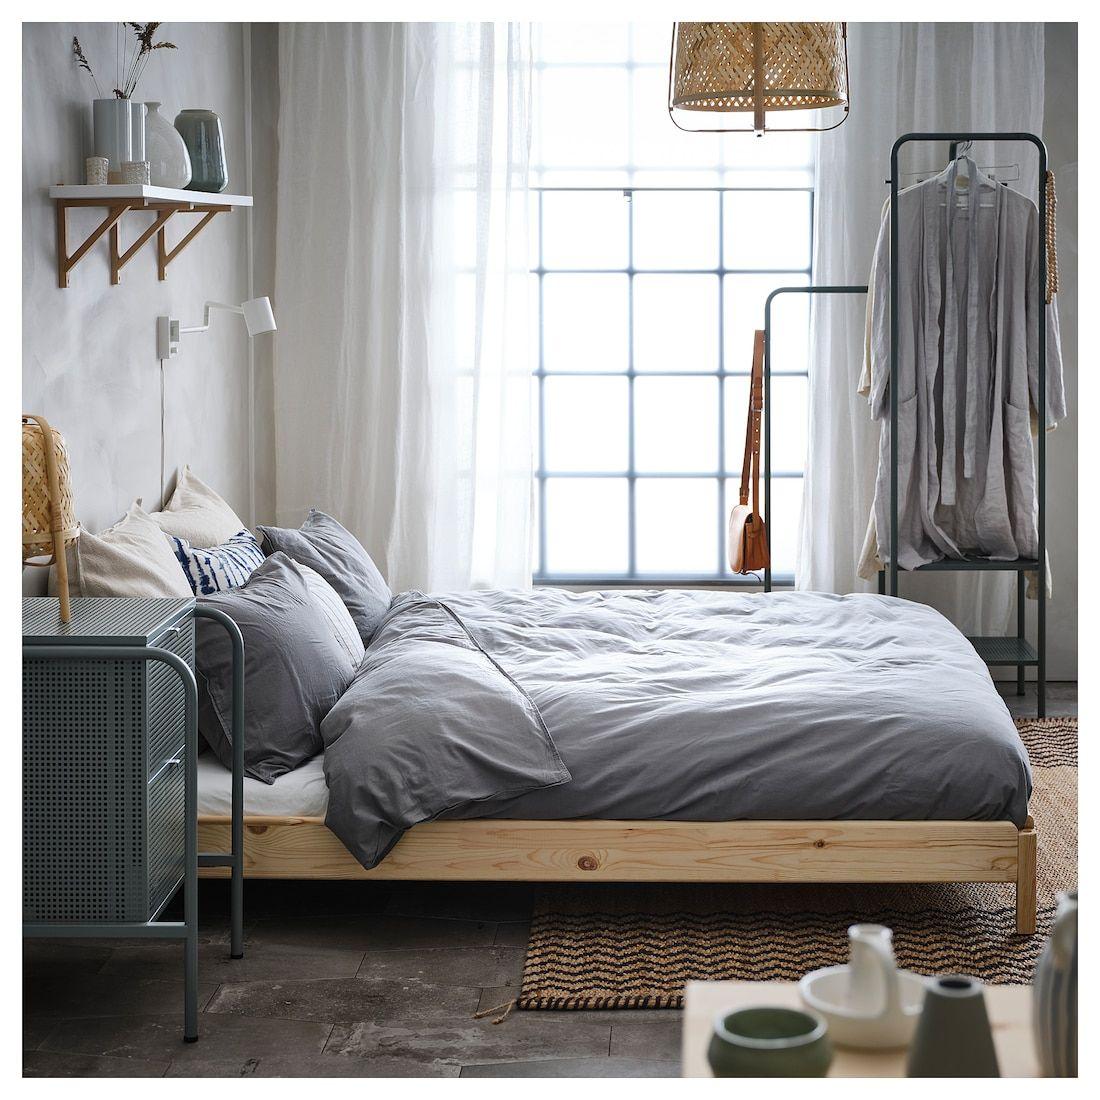 Utaker Stackable Bed With 2 Mattresses Pine Husvika Twin Ikea In 2020 Guest Bedroom Ikea Guest Bed